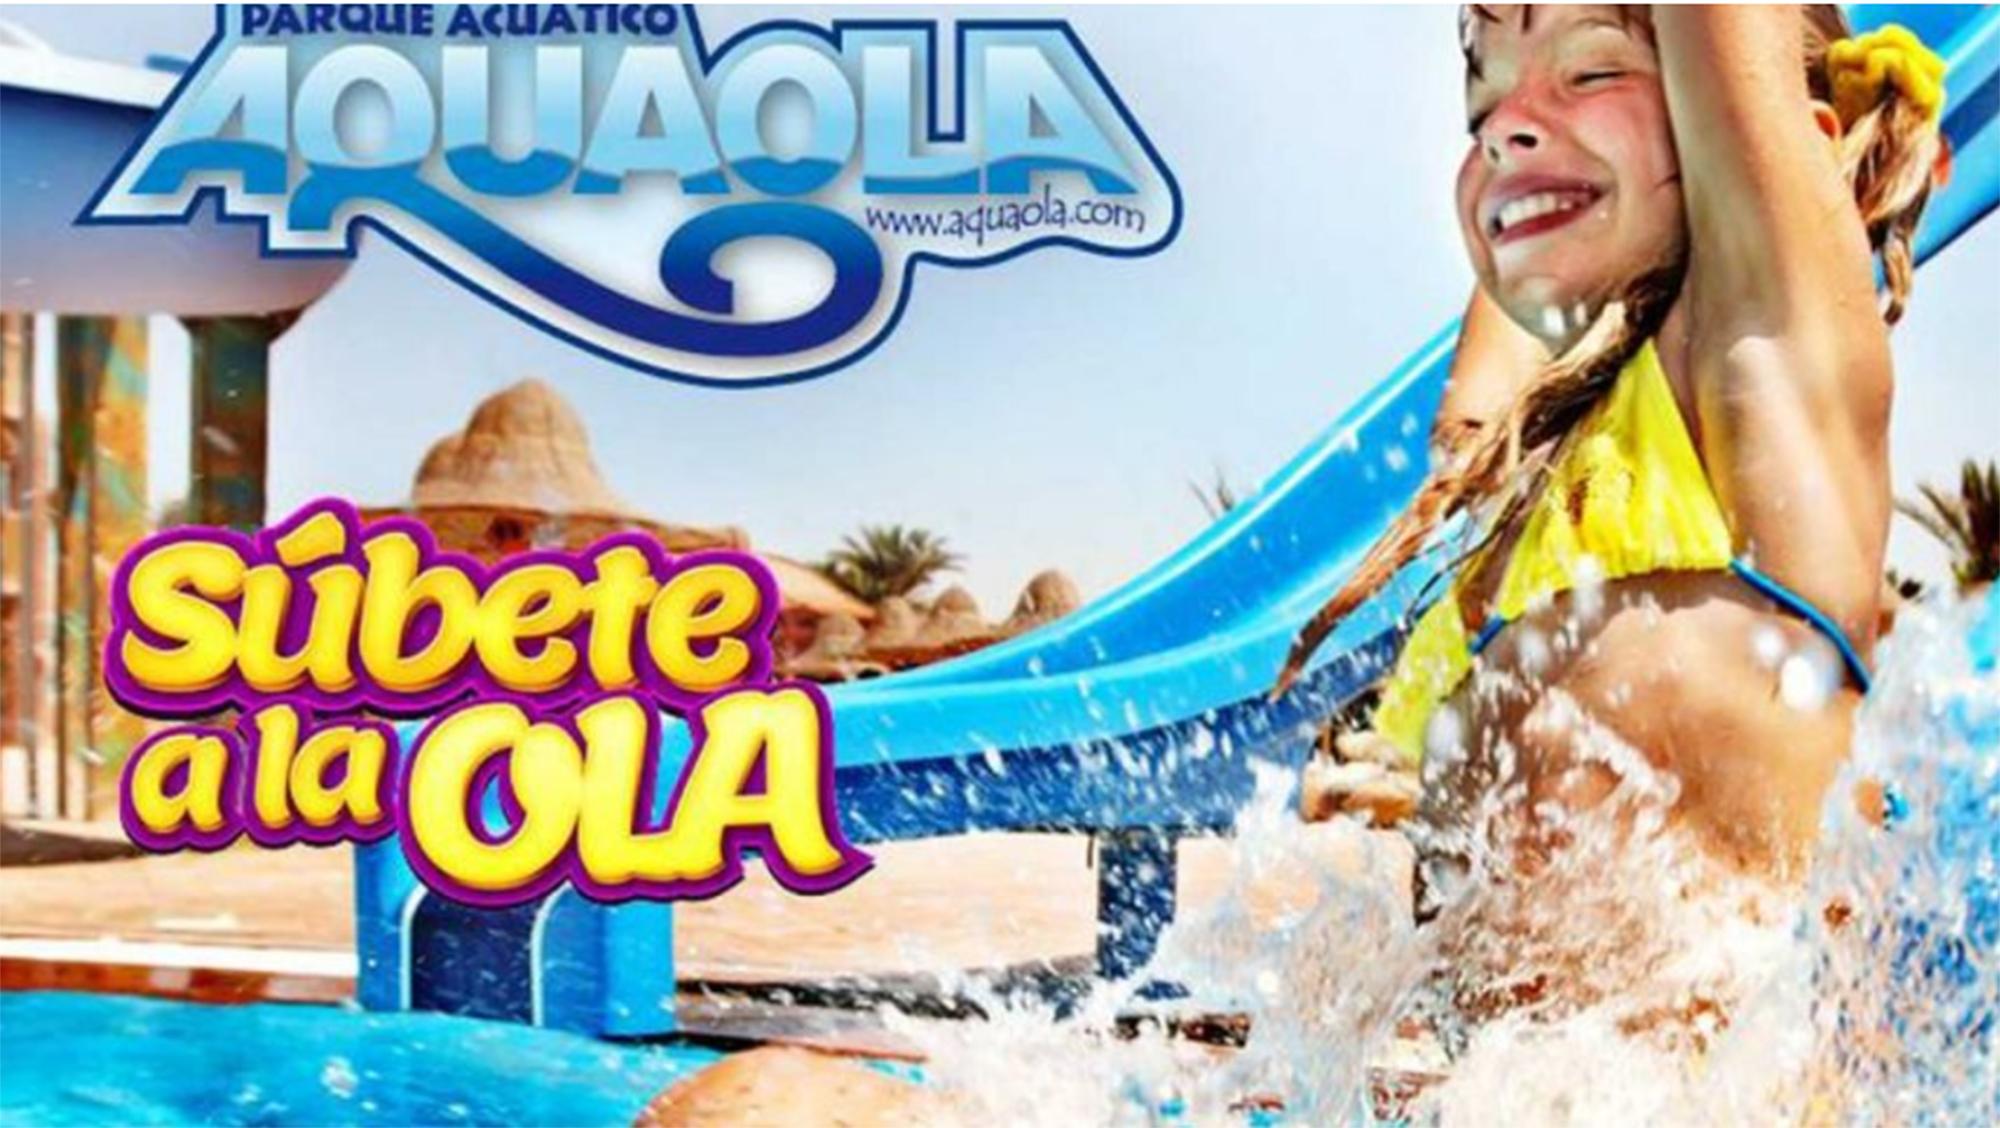 Aquaola